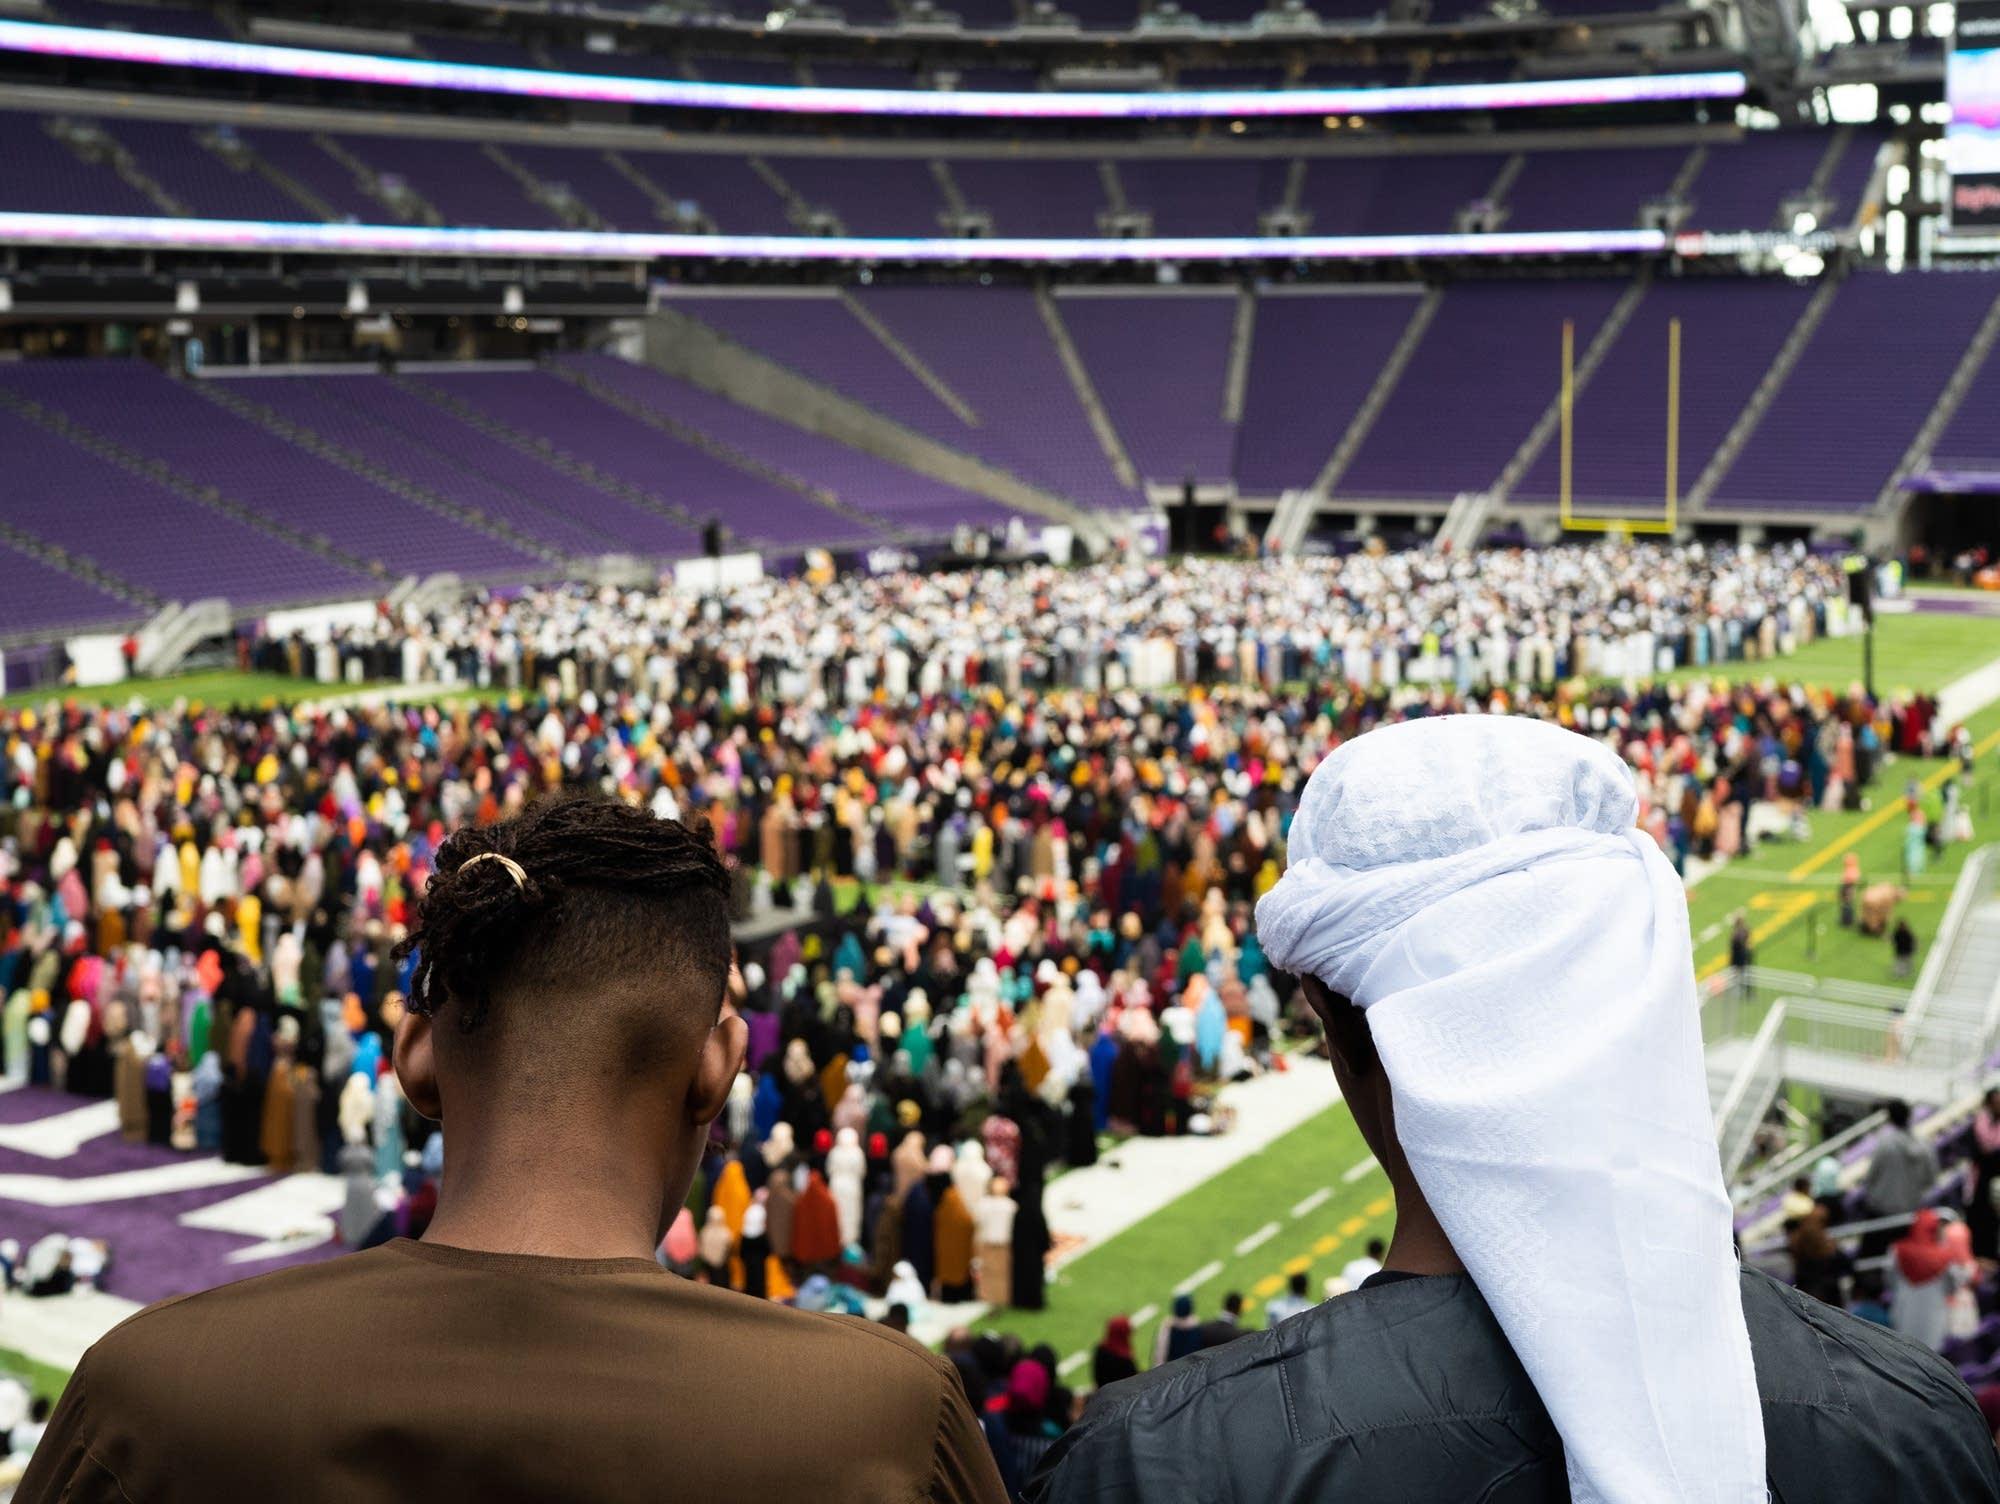 Photos: Thousands fill U S  Bank Stadium for 'Super Eid